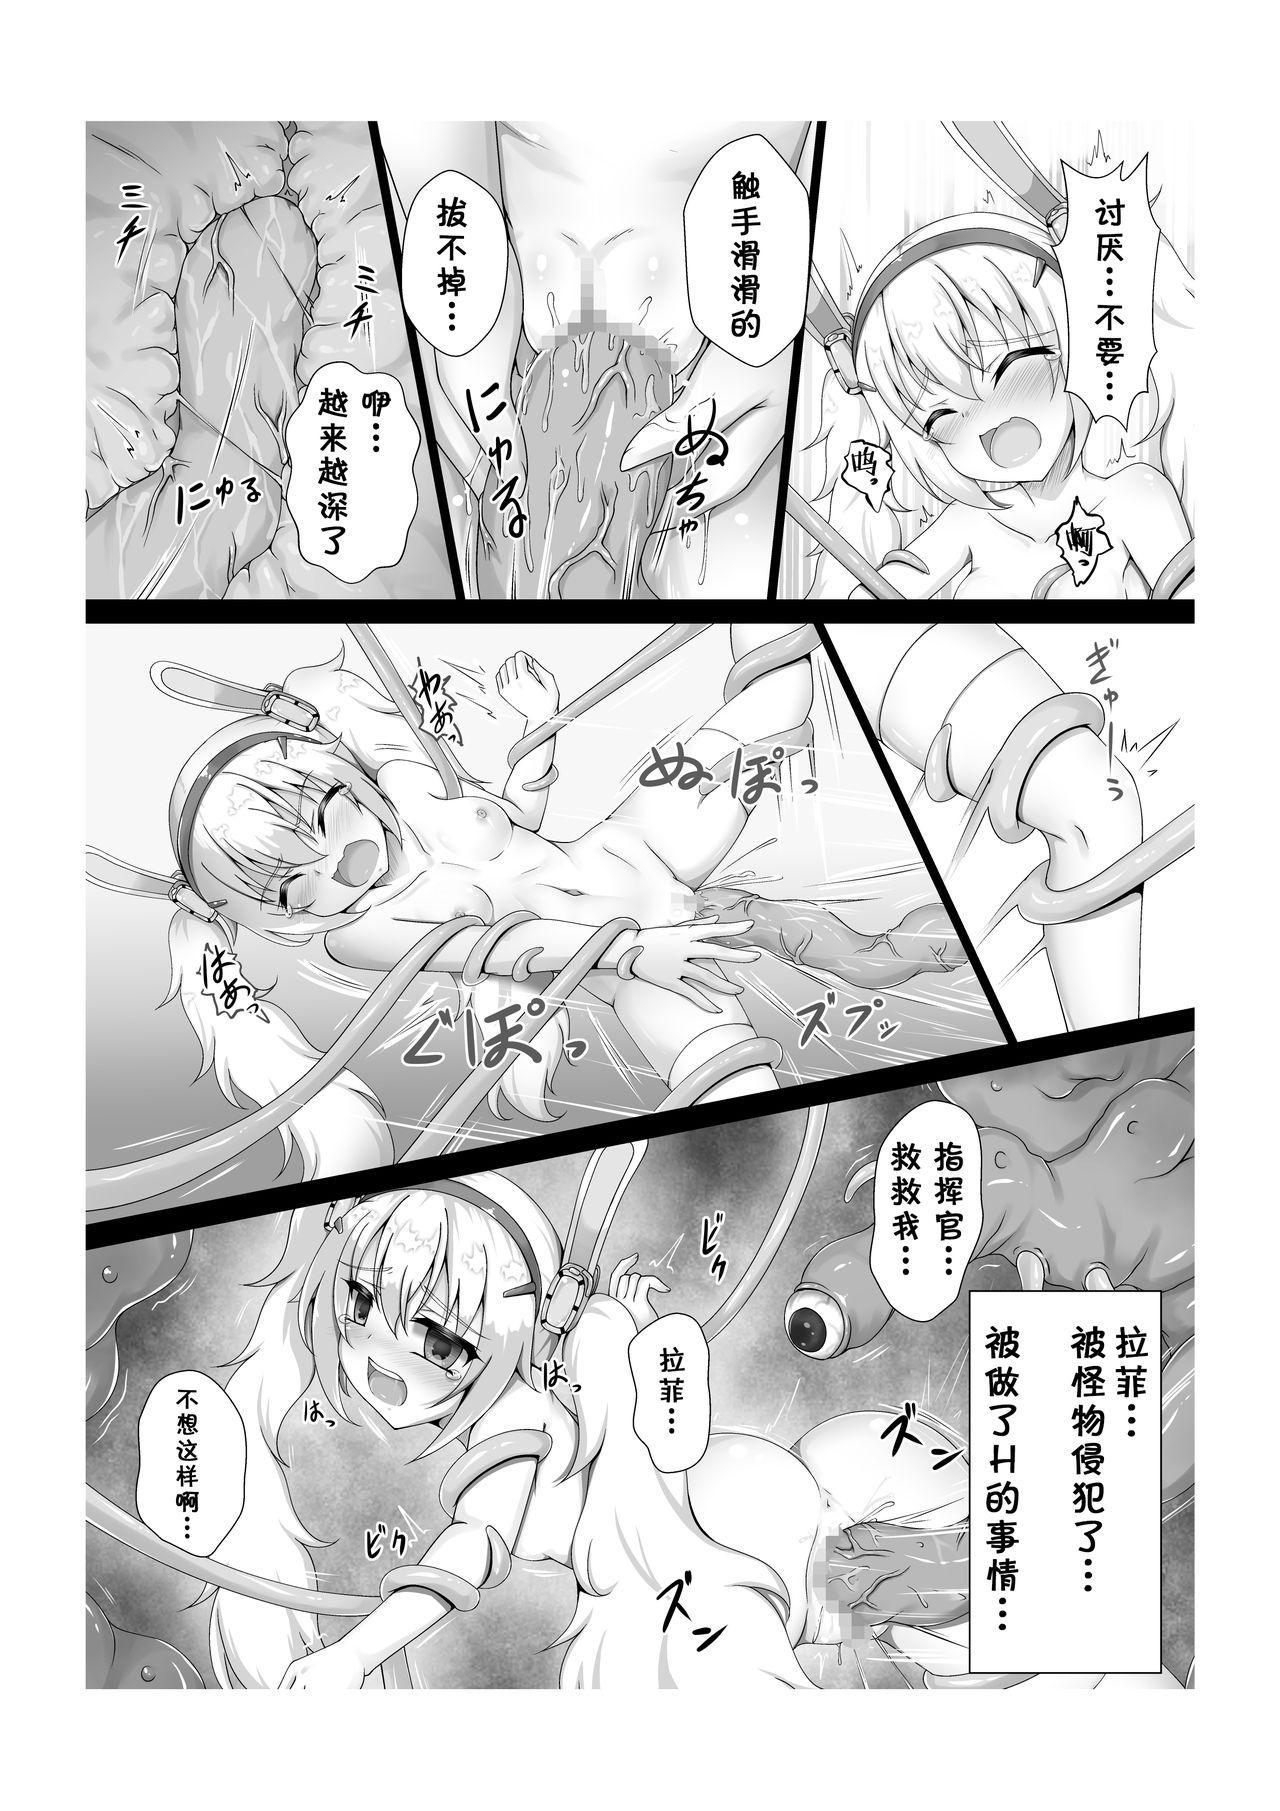 Monster Box Laffey + Omake CG 21